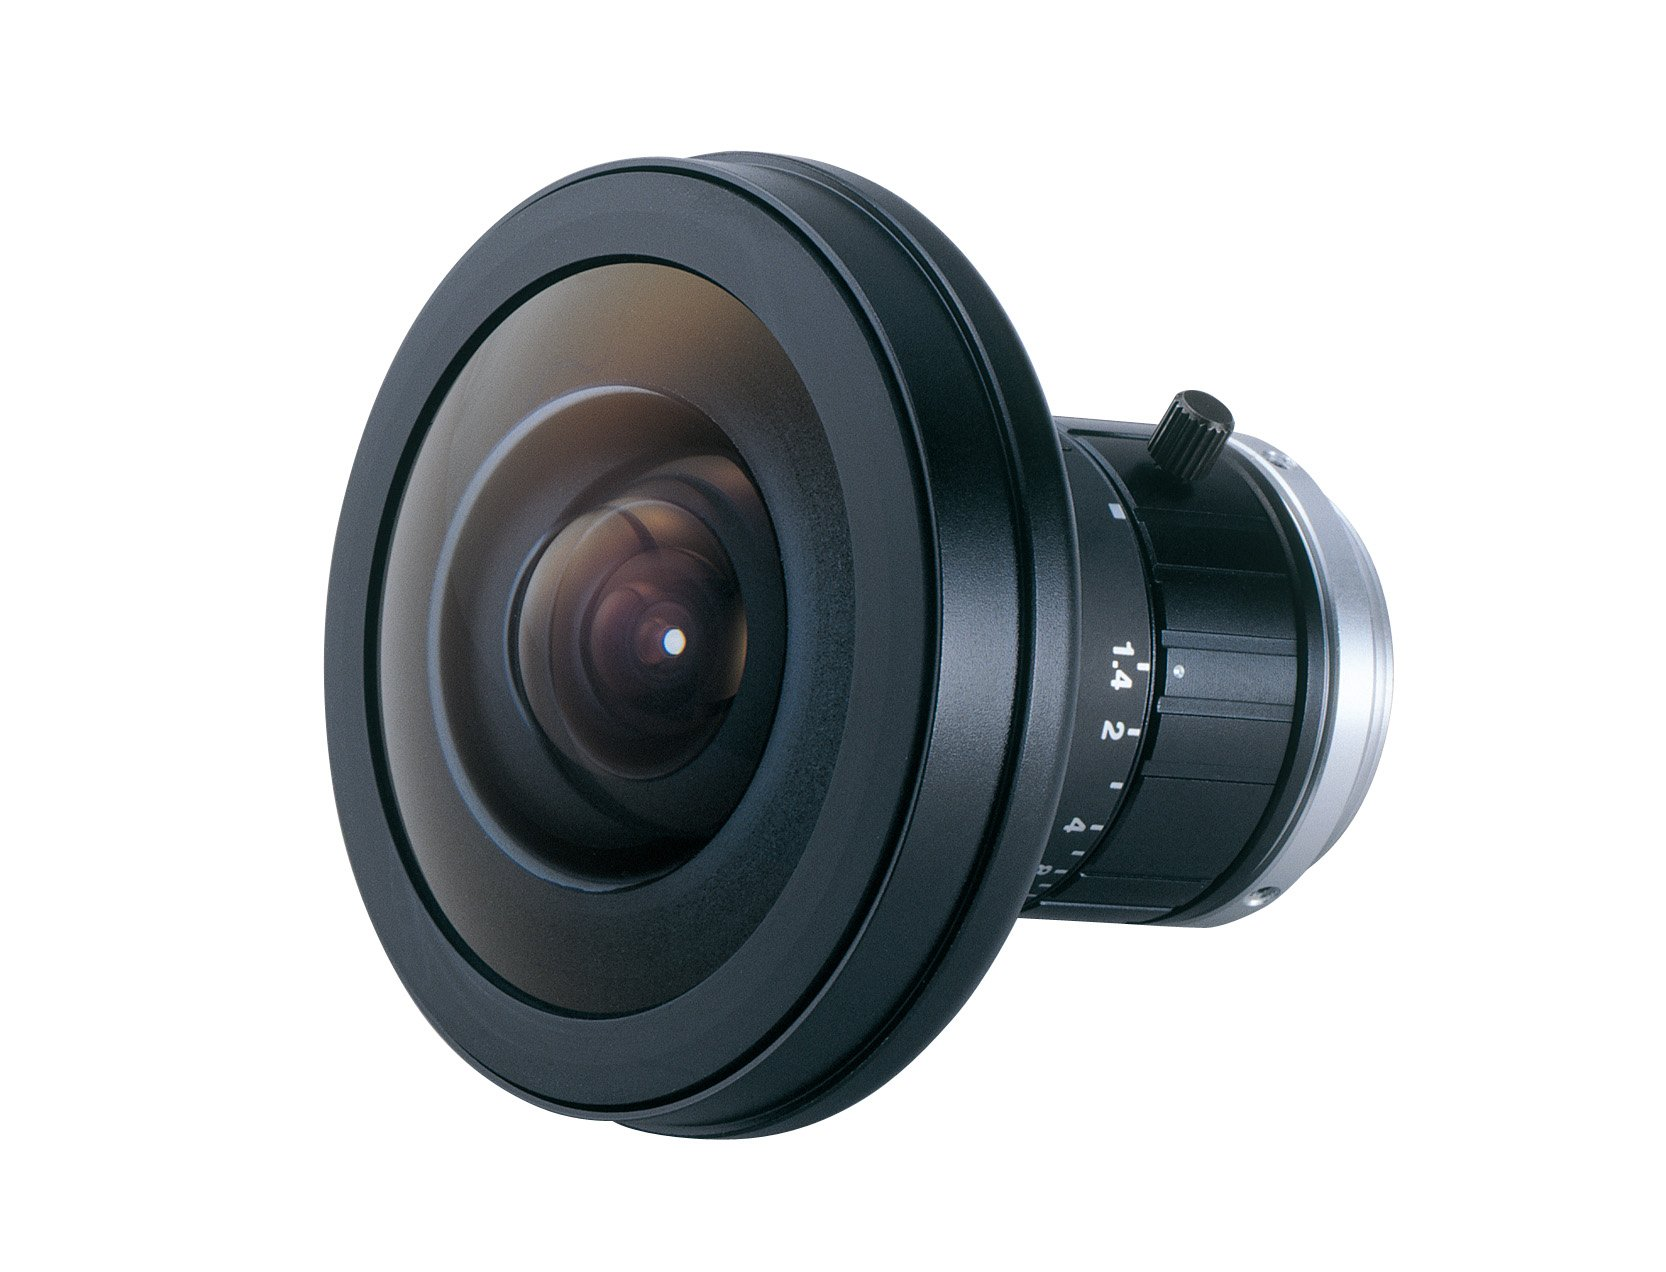 Fujinon FE185C086HA-1 1'' C-Mount 2.7mm F/1.8 Manual Iris Fisheye Lens for 5MP Cameras by Fujinon